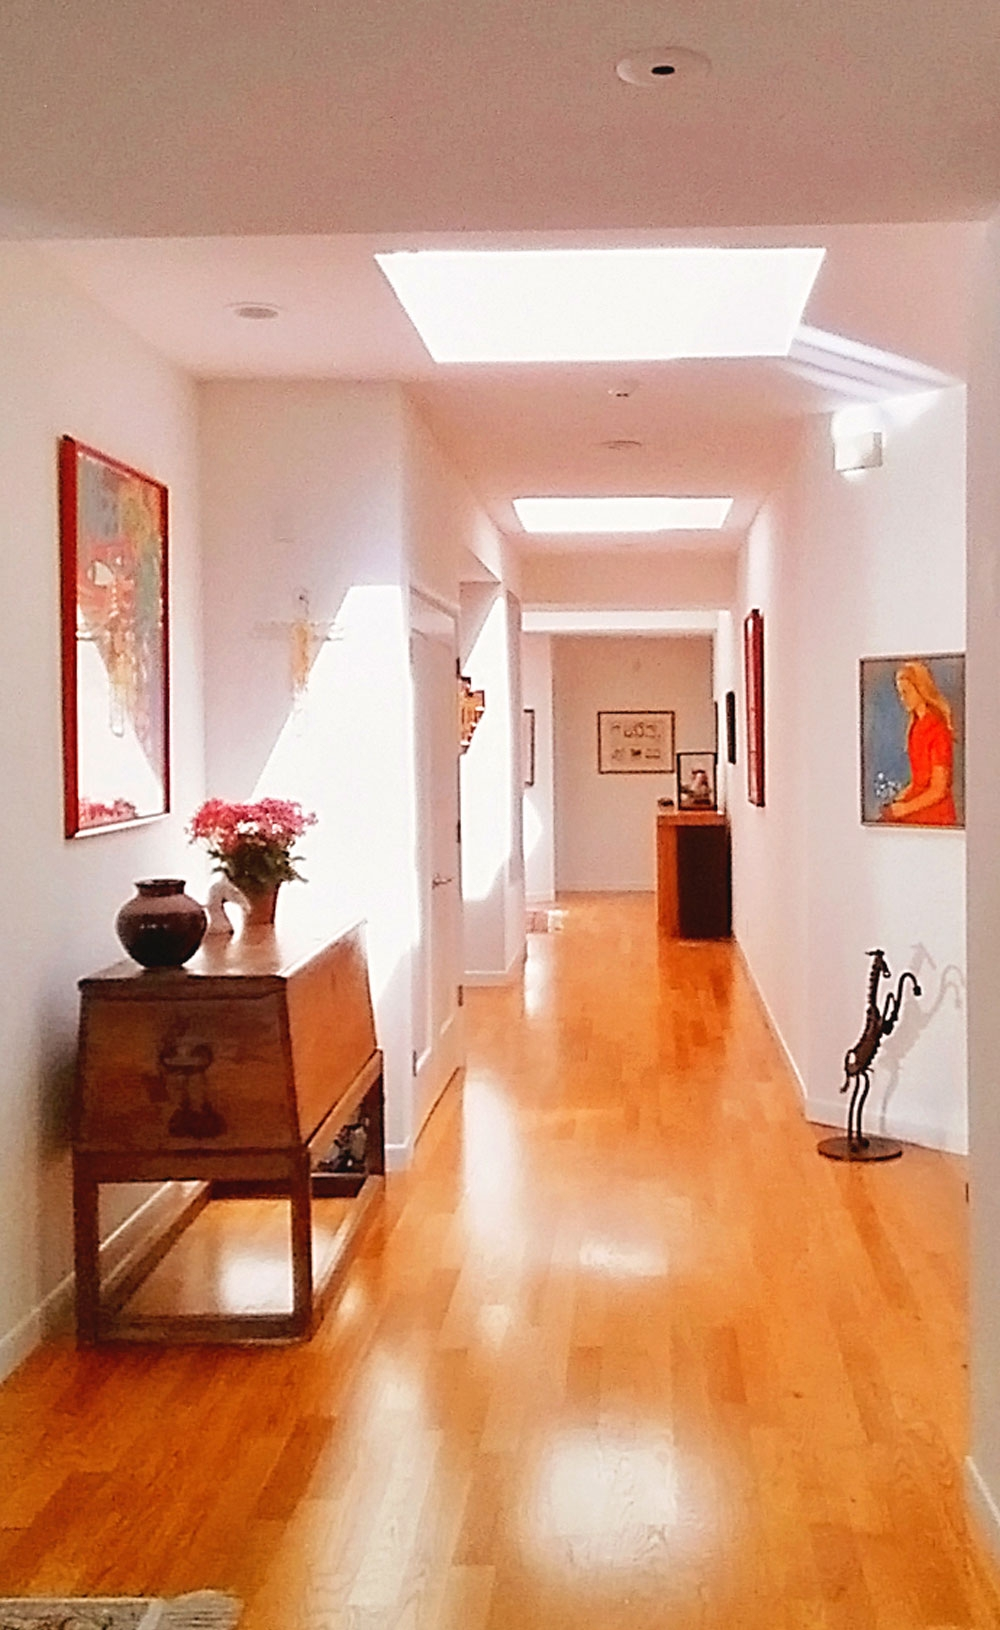 5-skylight-hardwood-floors-hallway-carawan-dee.jpg